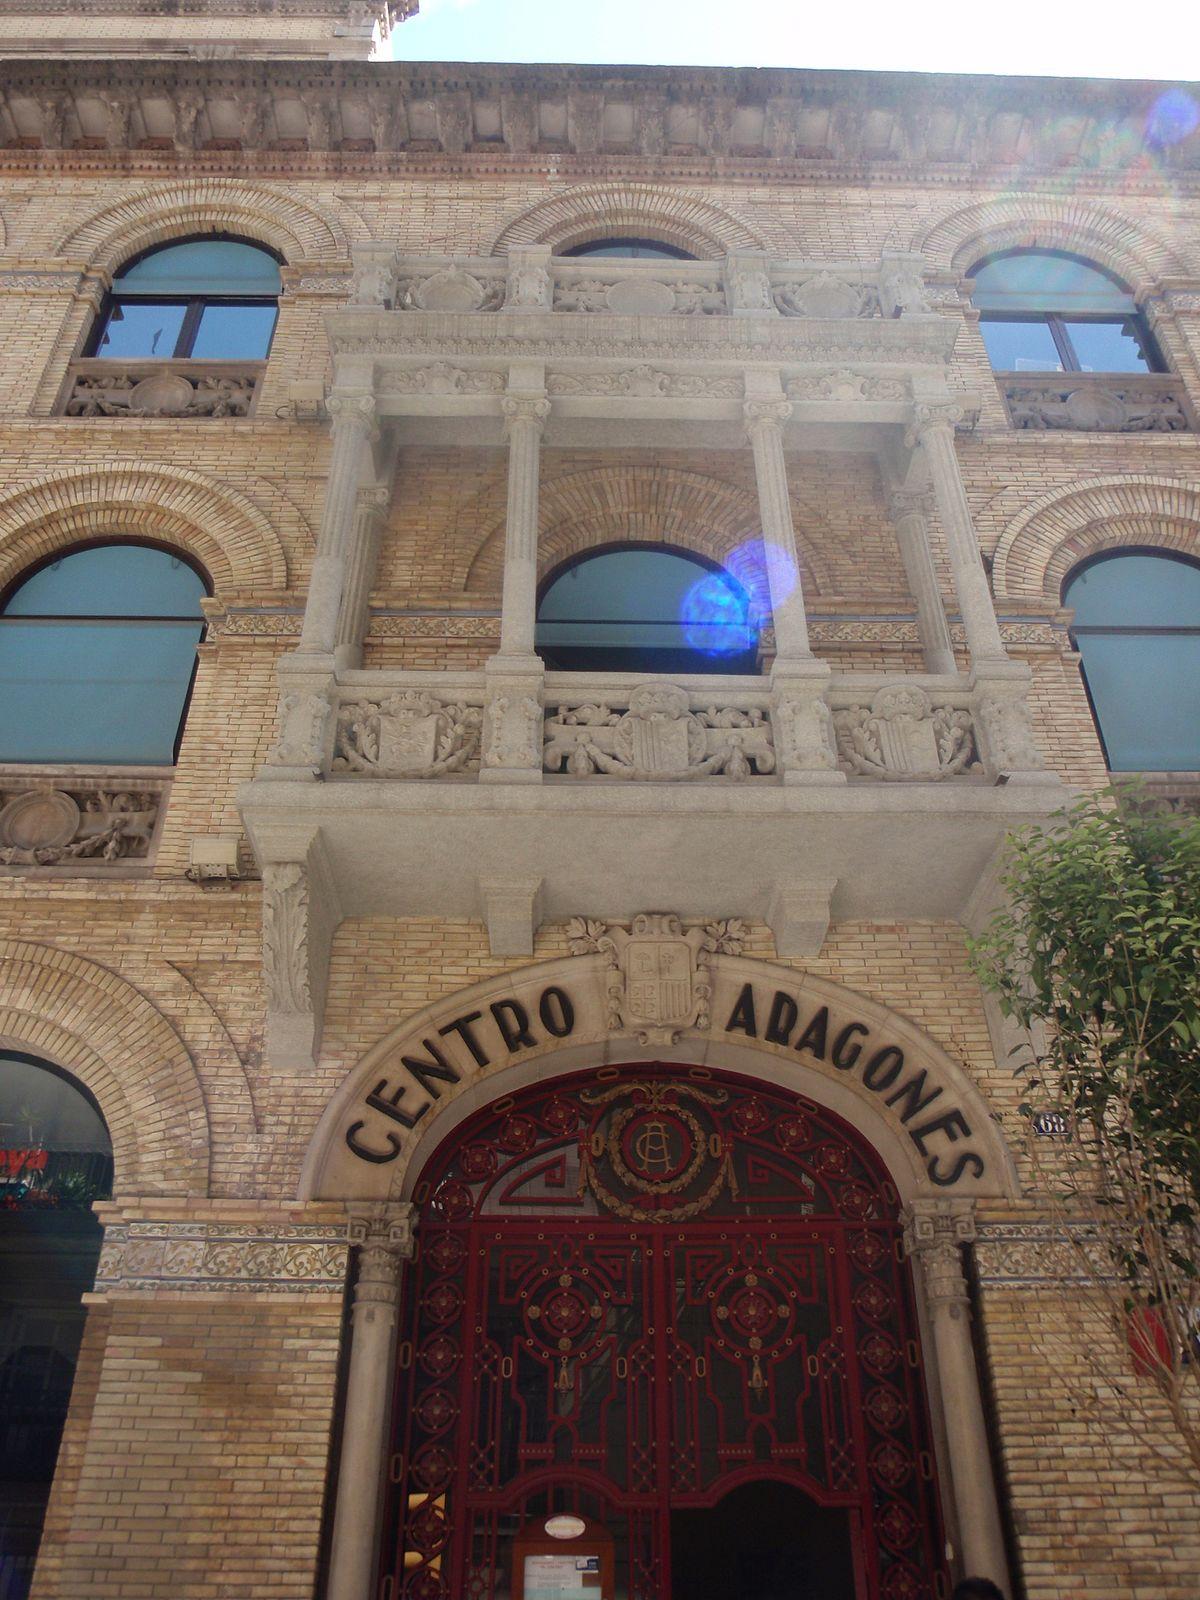 Centro aragon s de barcelona wikipedia la enciclopedia for Centros de jardineria barcelona